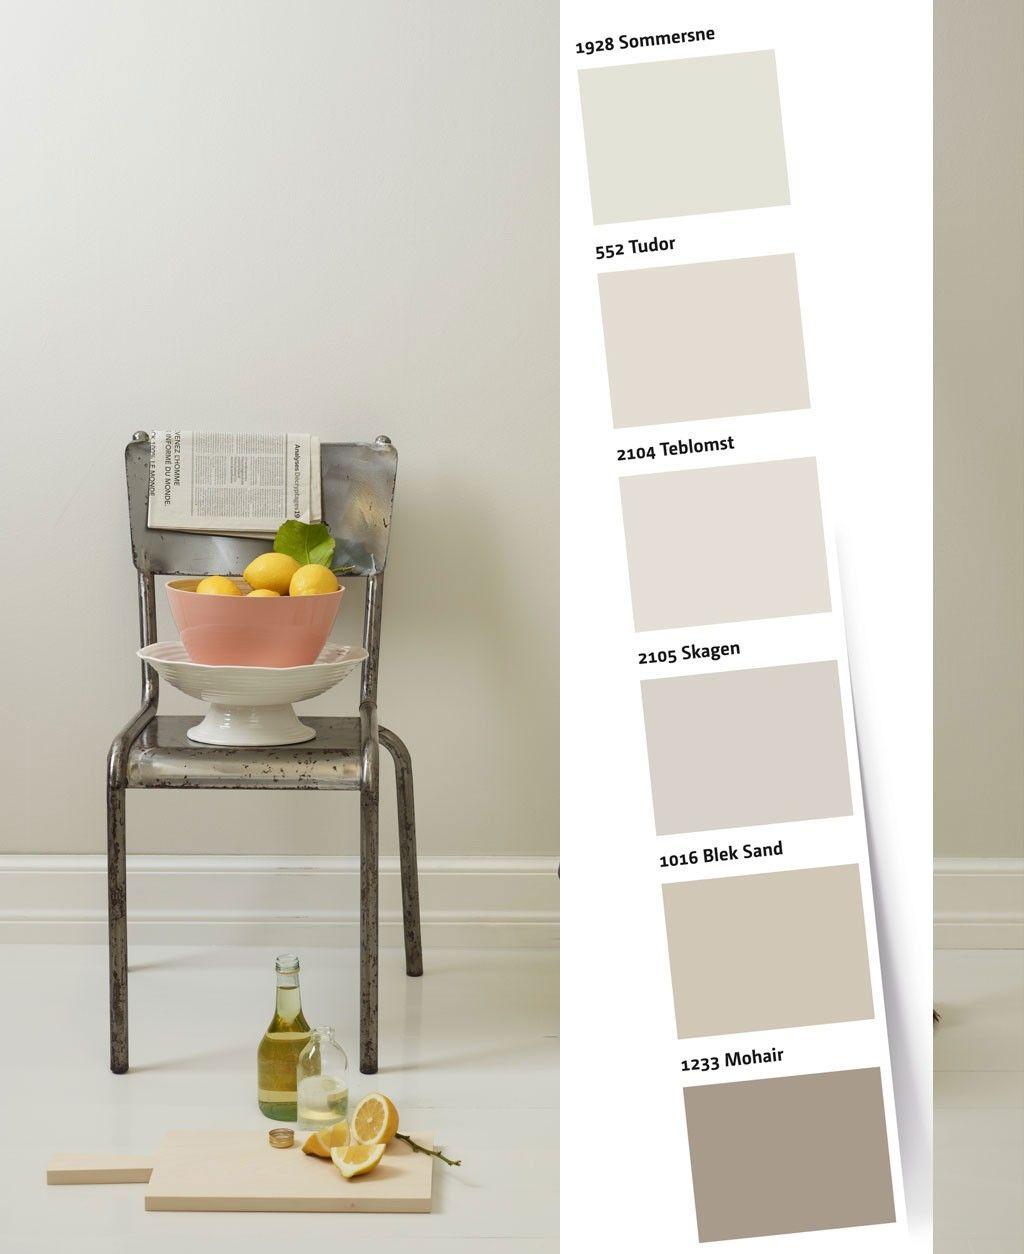 Jotun Interior Paint Color Chart Pdf: Image Result For Klassisk Hvit Jotun